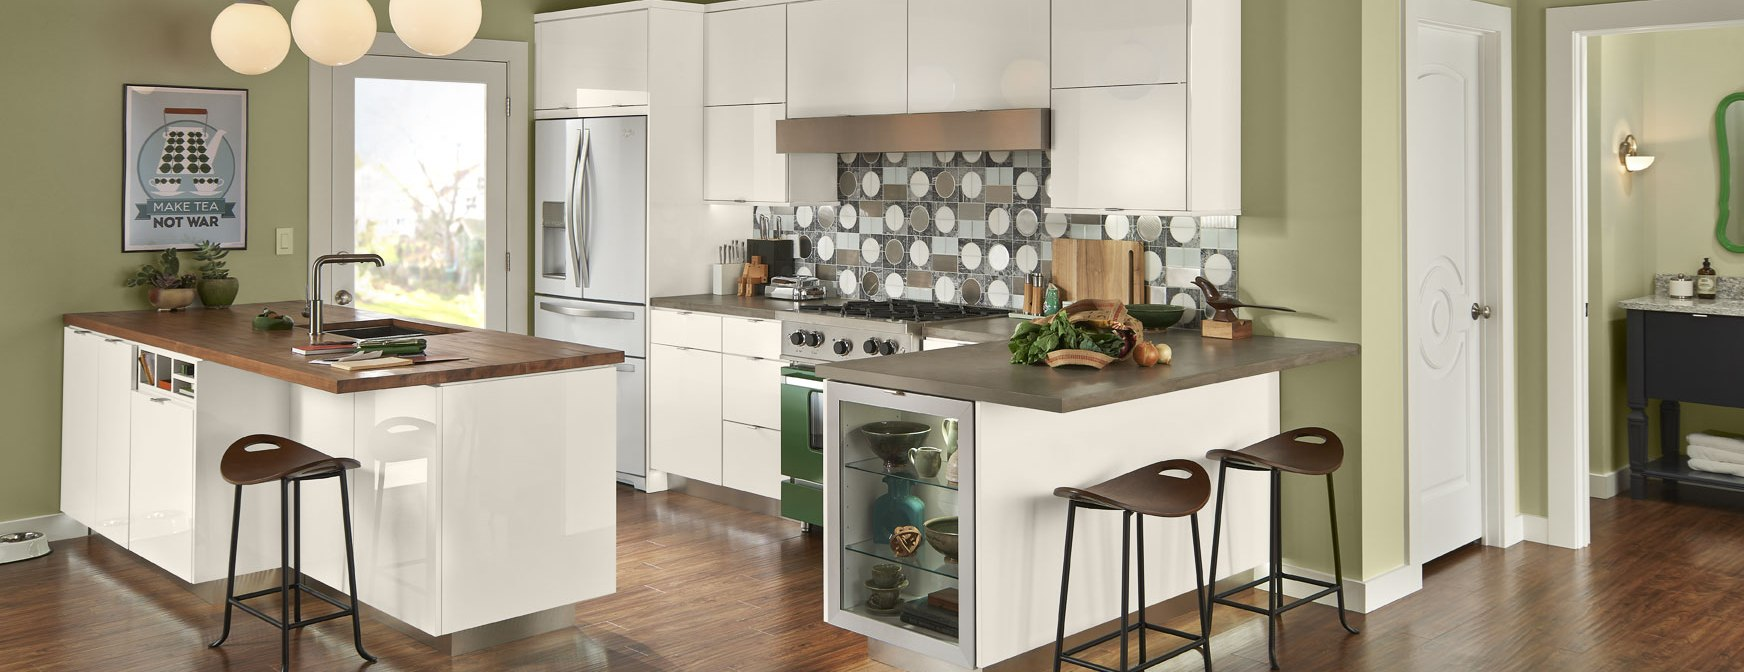 kraftmaid kitchen cabinets ideas islands repinly design kraftmaid cabinets authorized dealer designer cabinets